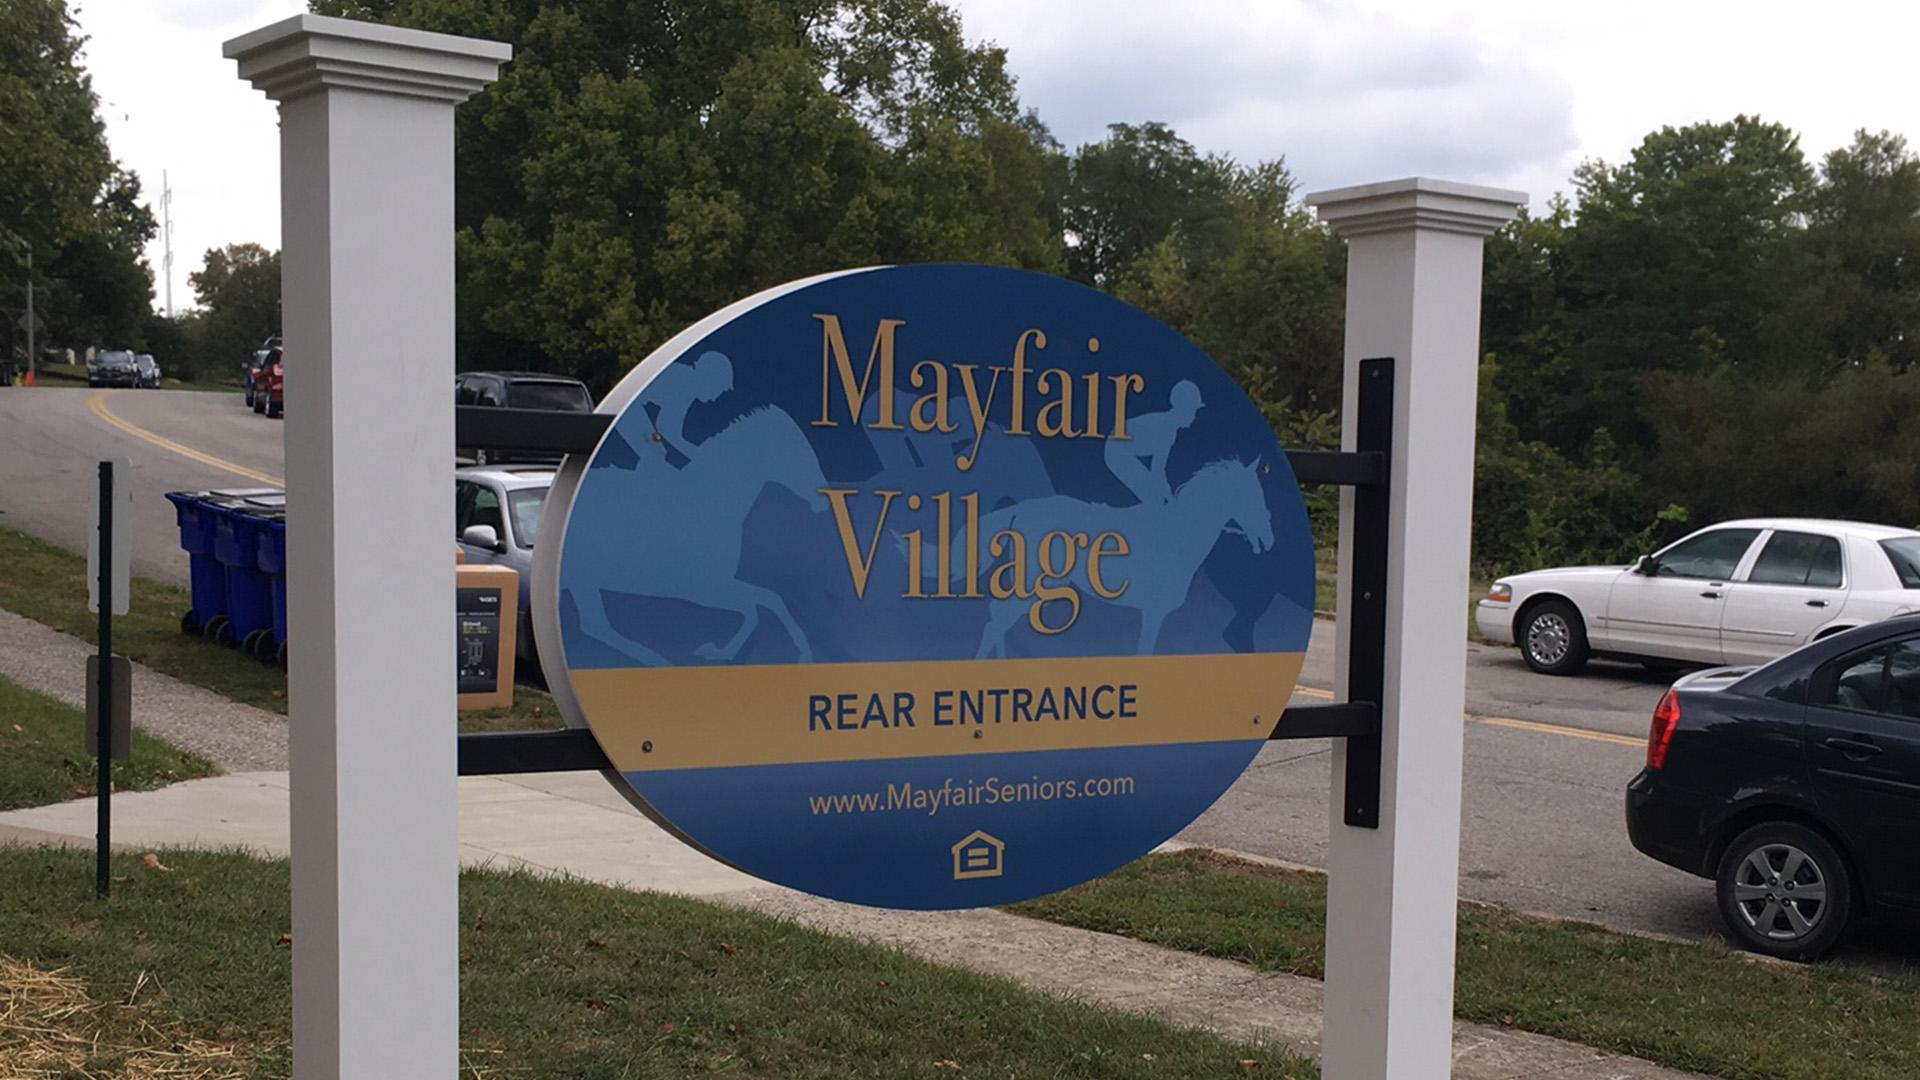 Mayfair Village outdoor sign